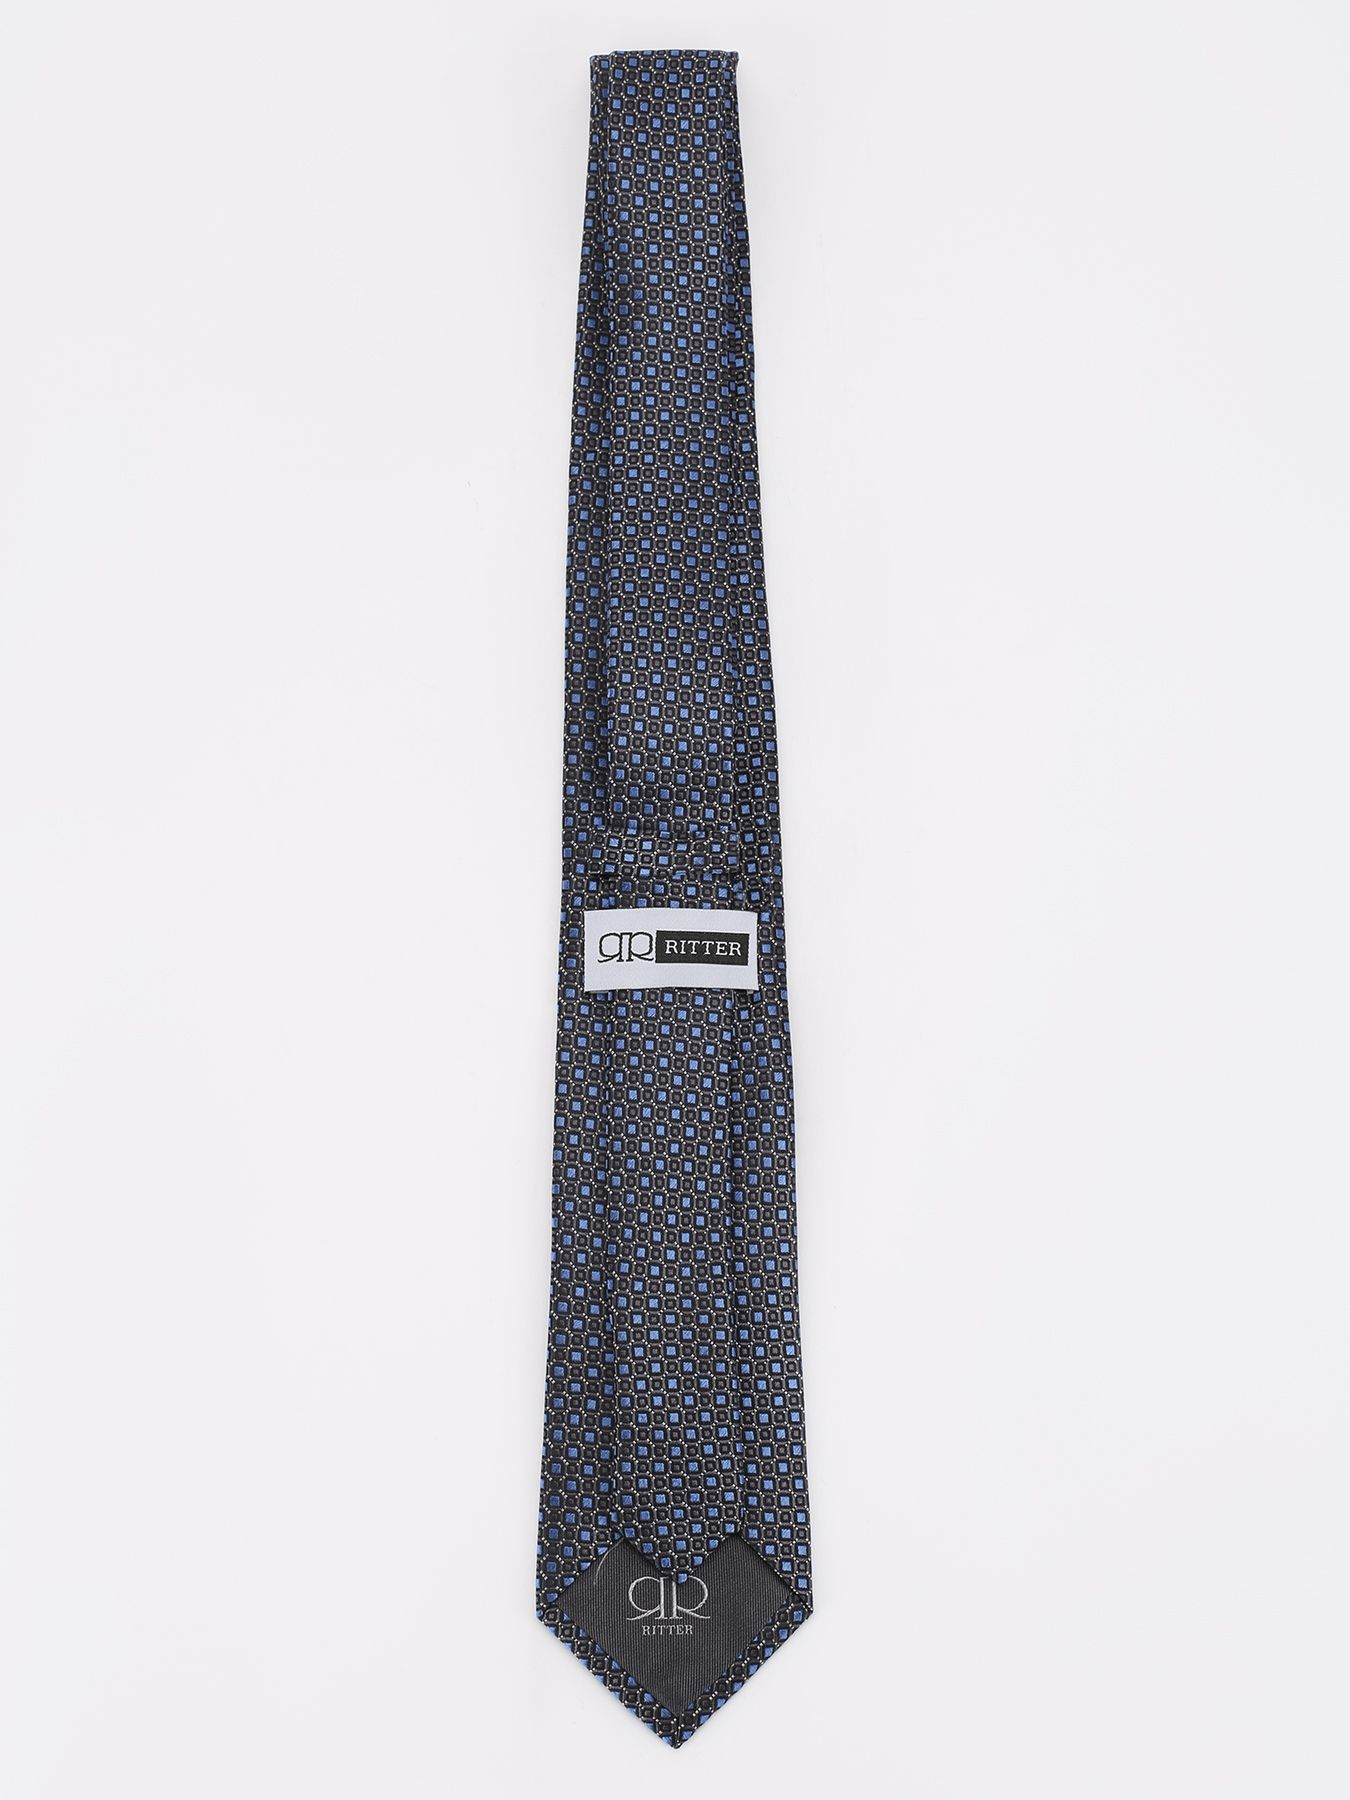 Ritter Шелковый галстук 312364-185 Фото 2